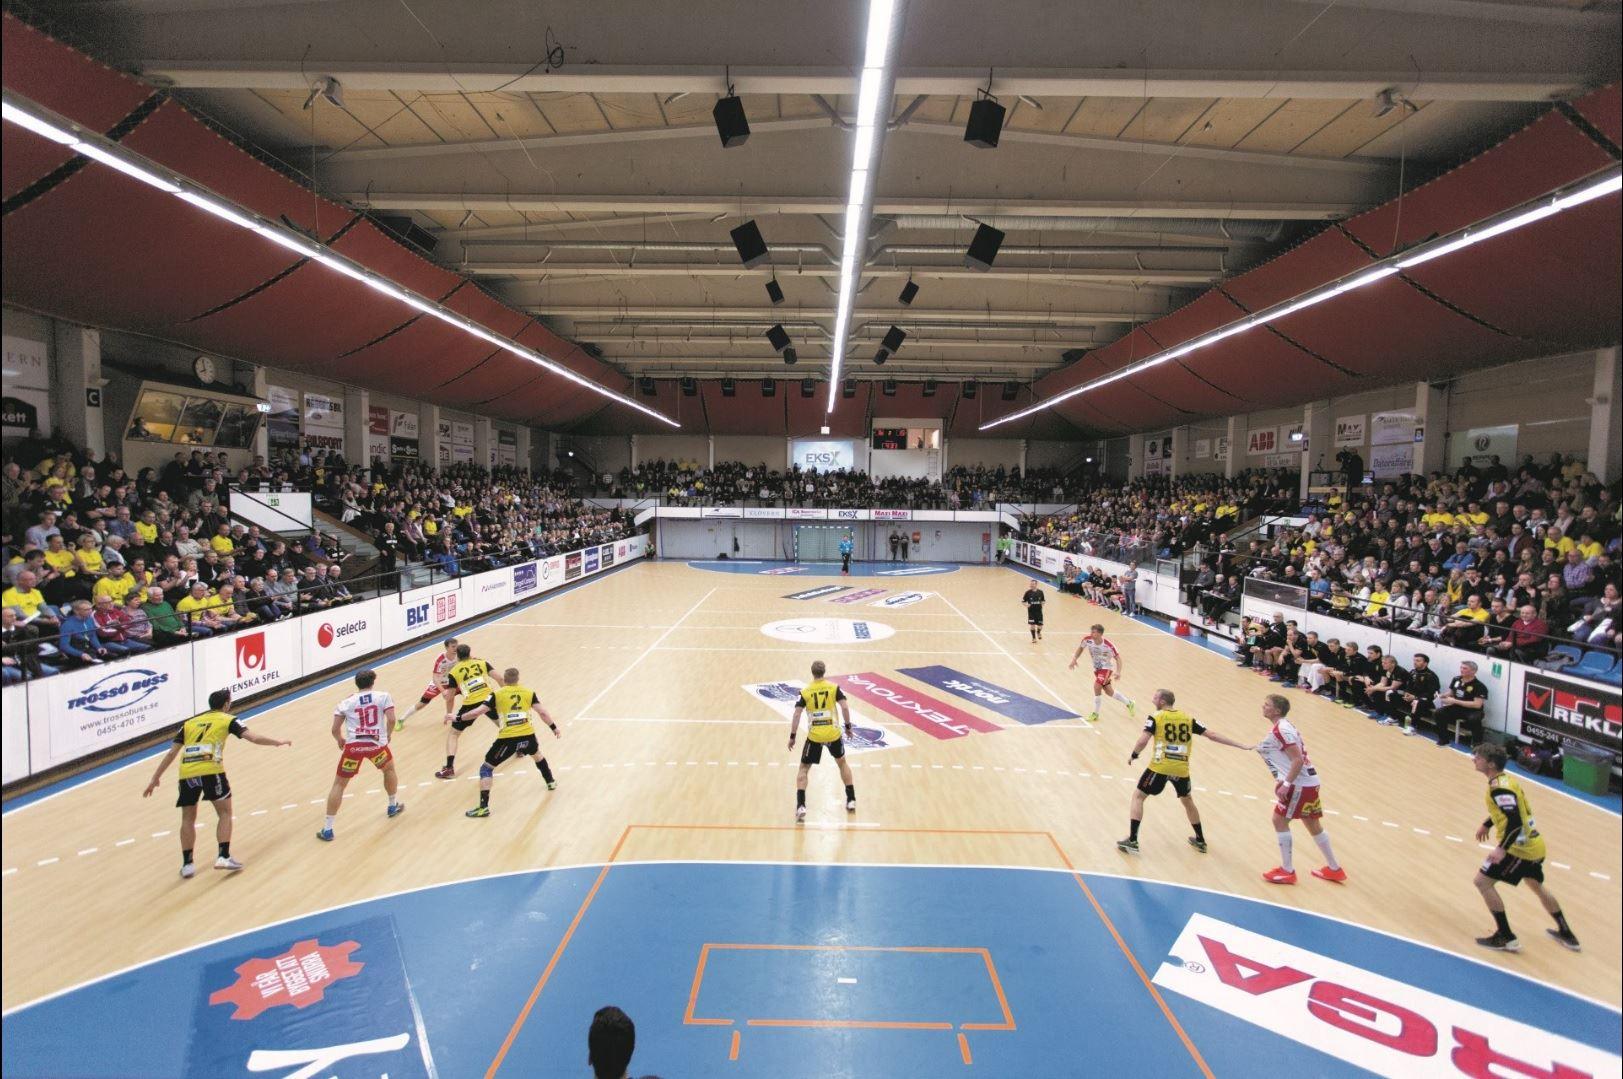 Series match: HIF Karlskrona - Ystads IF